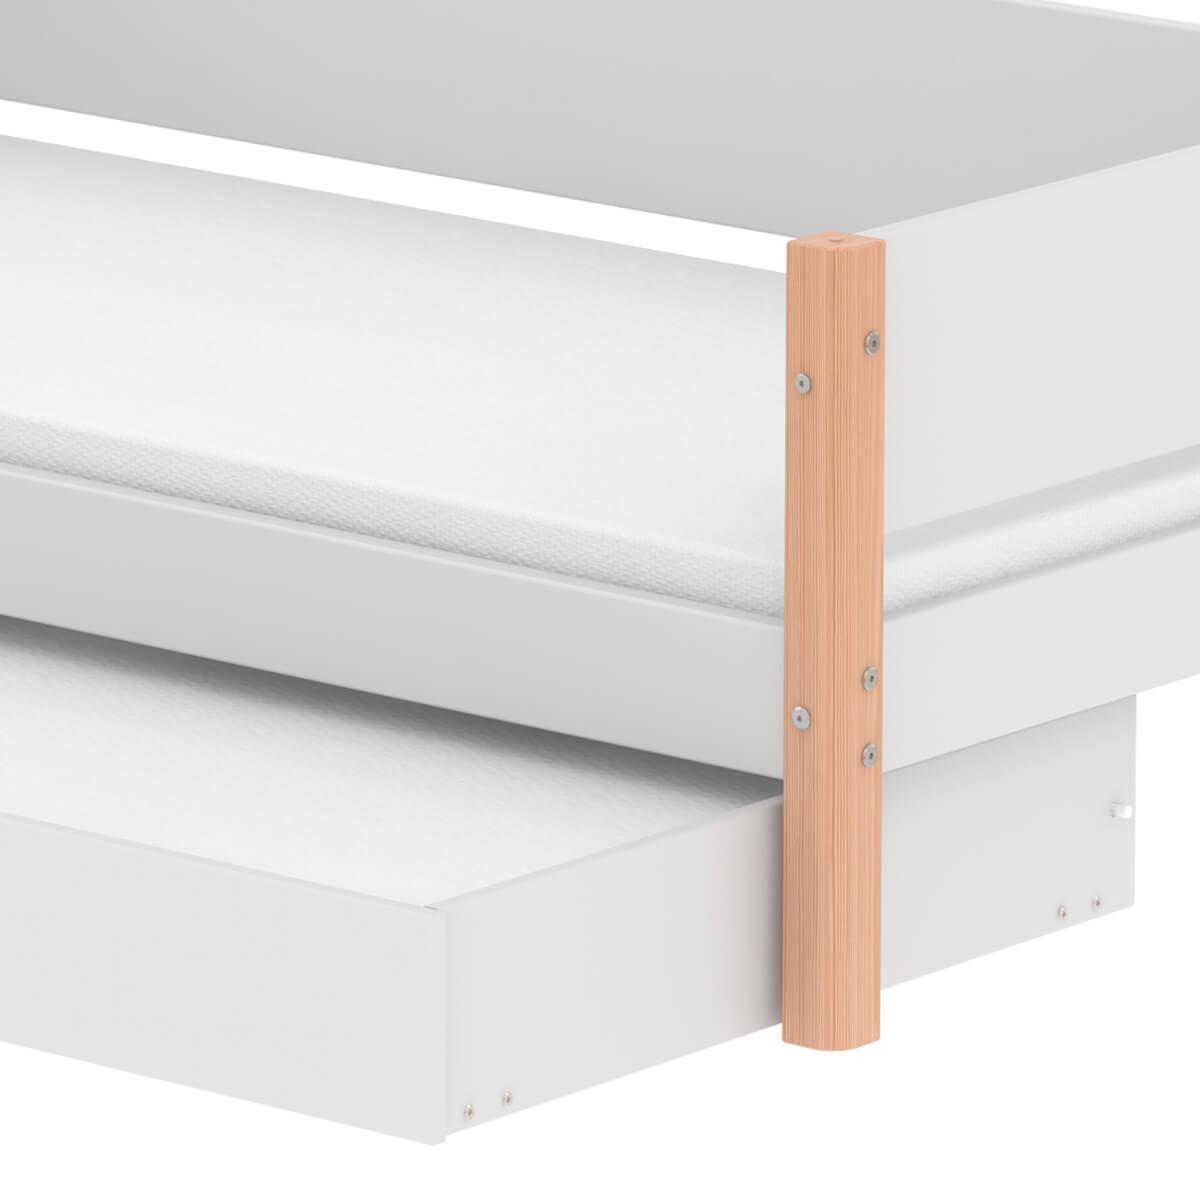 Lit enfant simple 90x190cm lit gigogne WHITE Flexa naturel-blanc